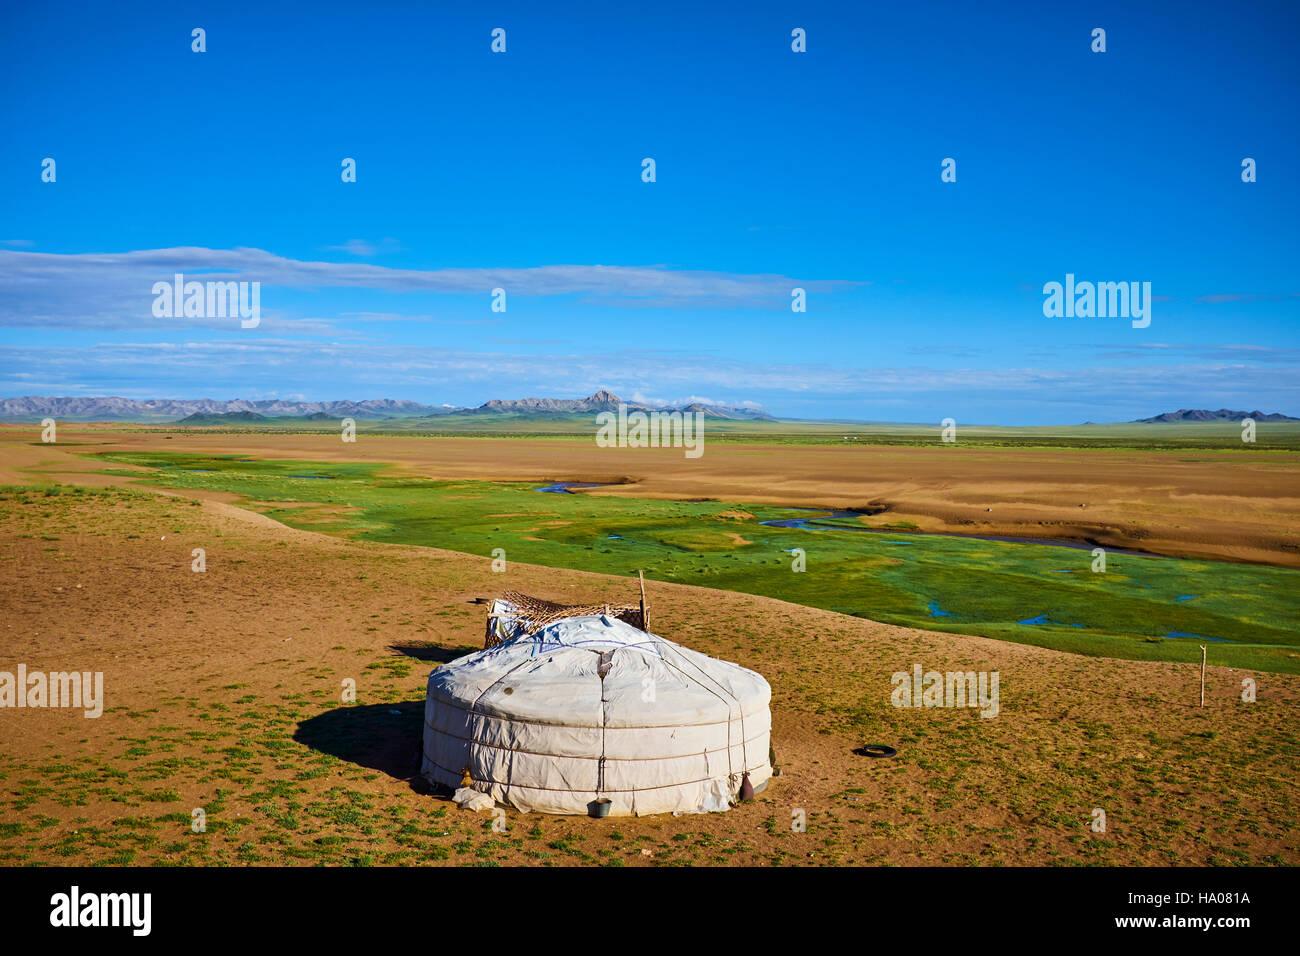 Mongolia, provincia de Zavkhan, Campamento nómada en la estepa Imagen De Stock